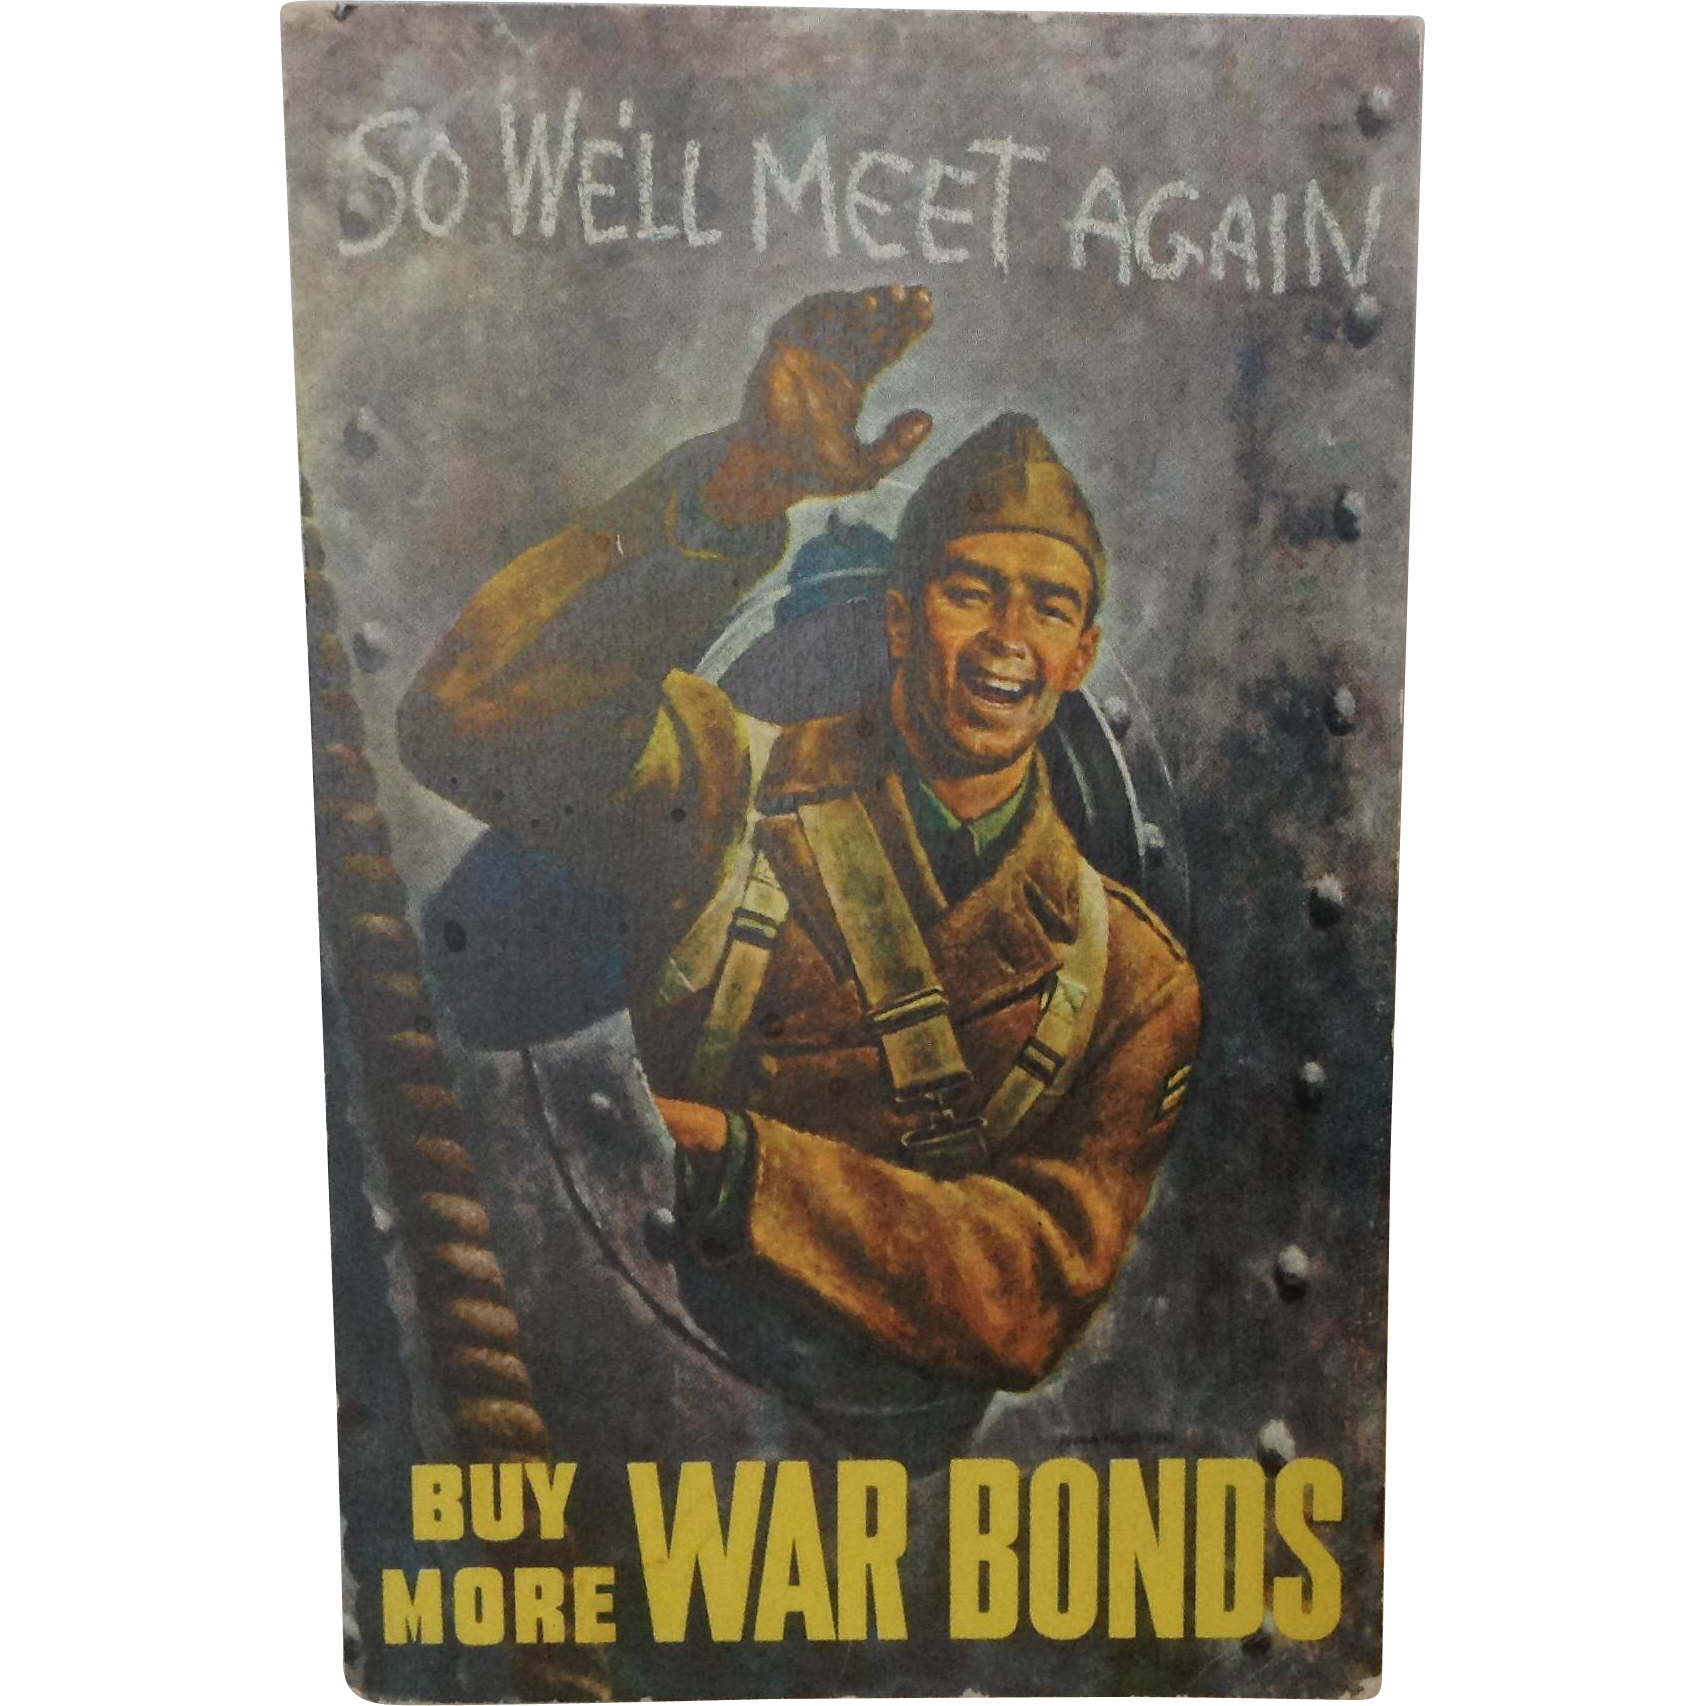 Movie Poster style postcard World War ll. Buy More War Bonds. So We'll Meet again